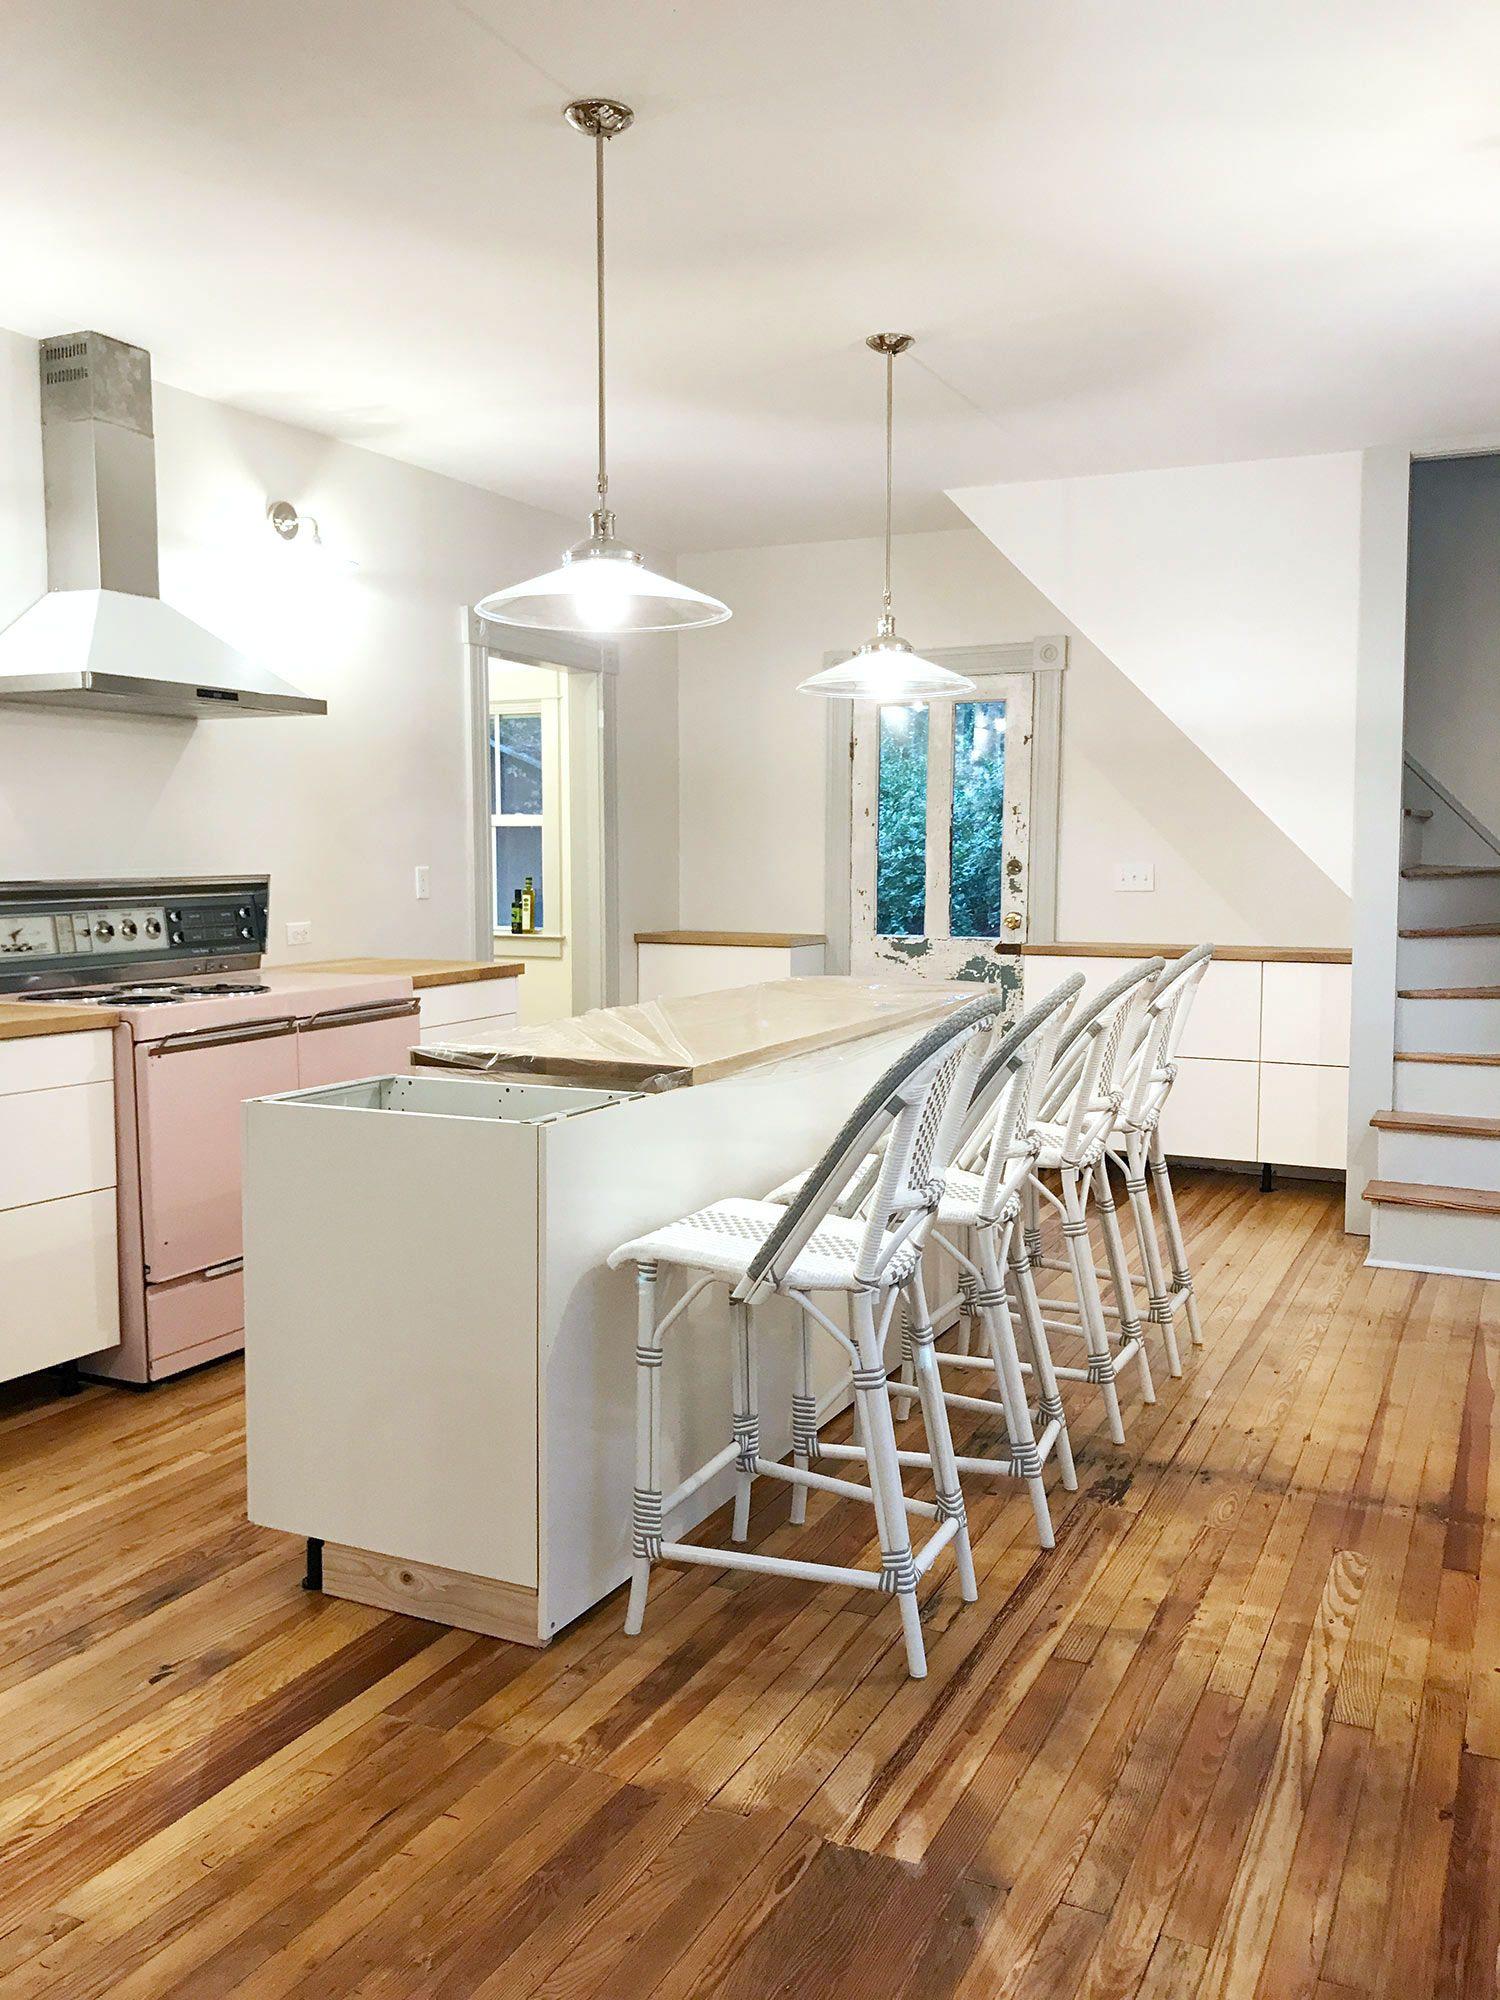 Excelente Diseño De Home Depot Conectar Planificador De Cocinas En ...